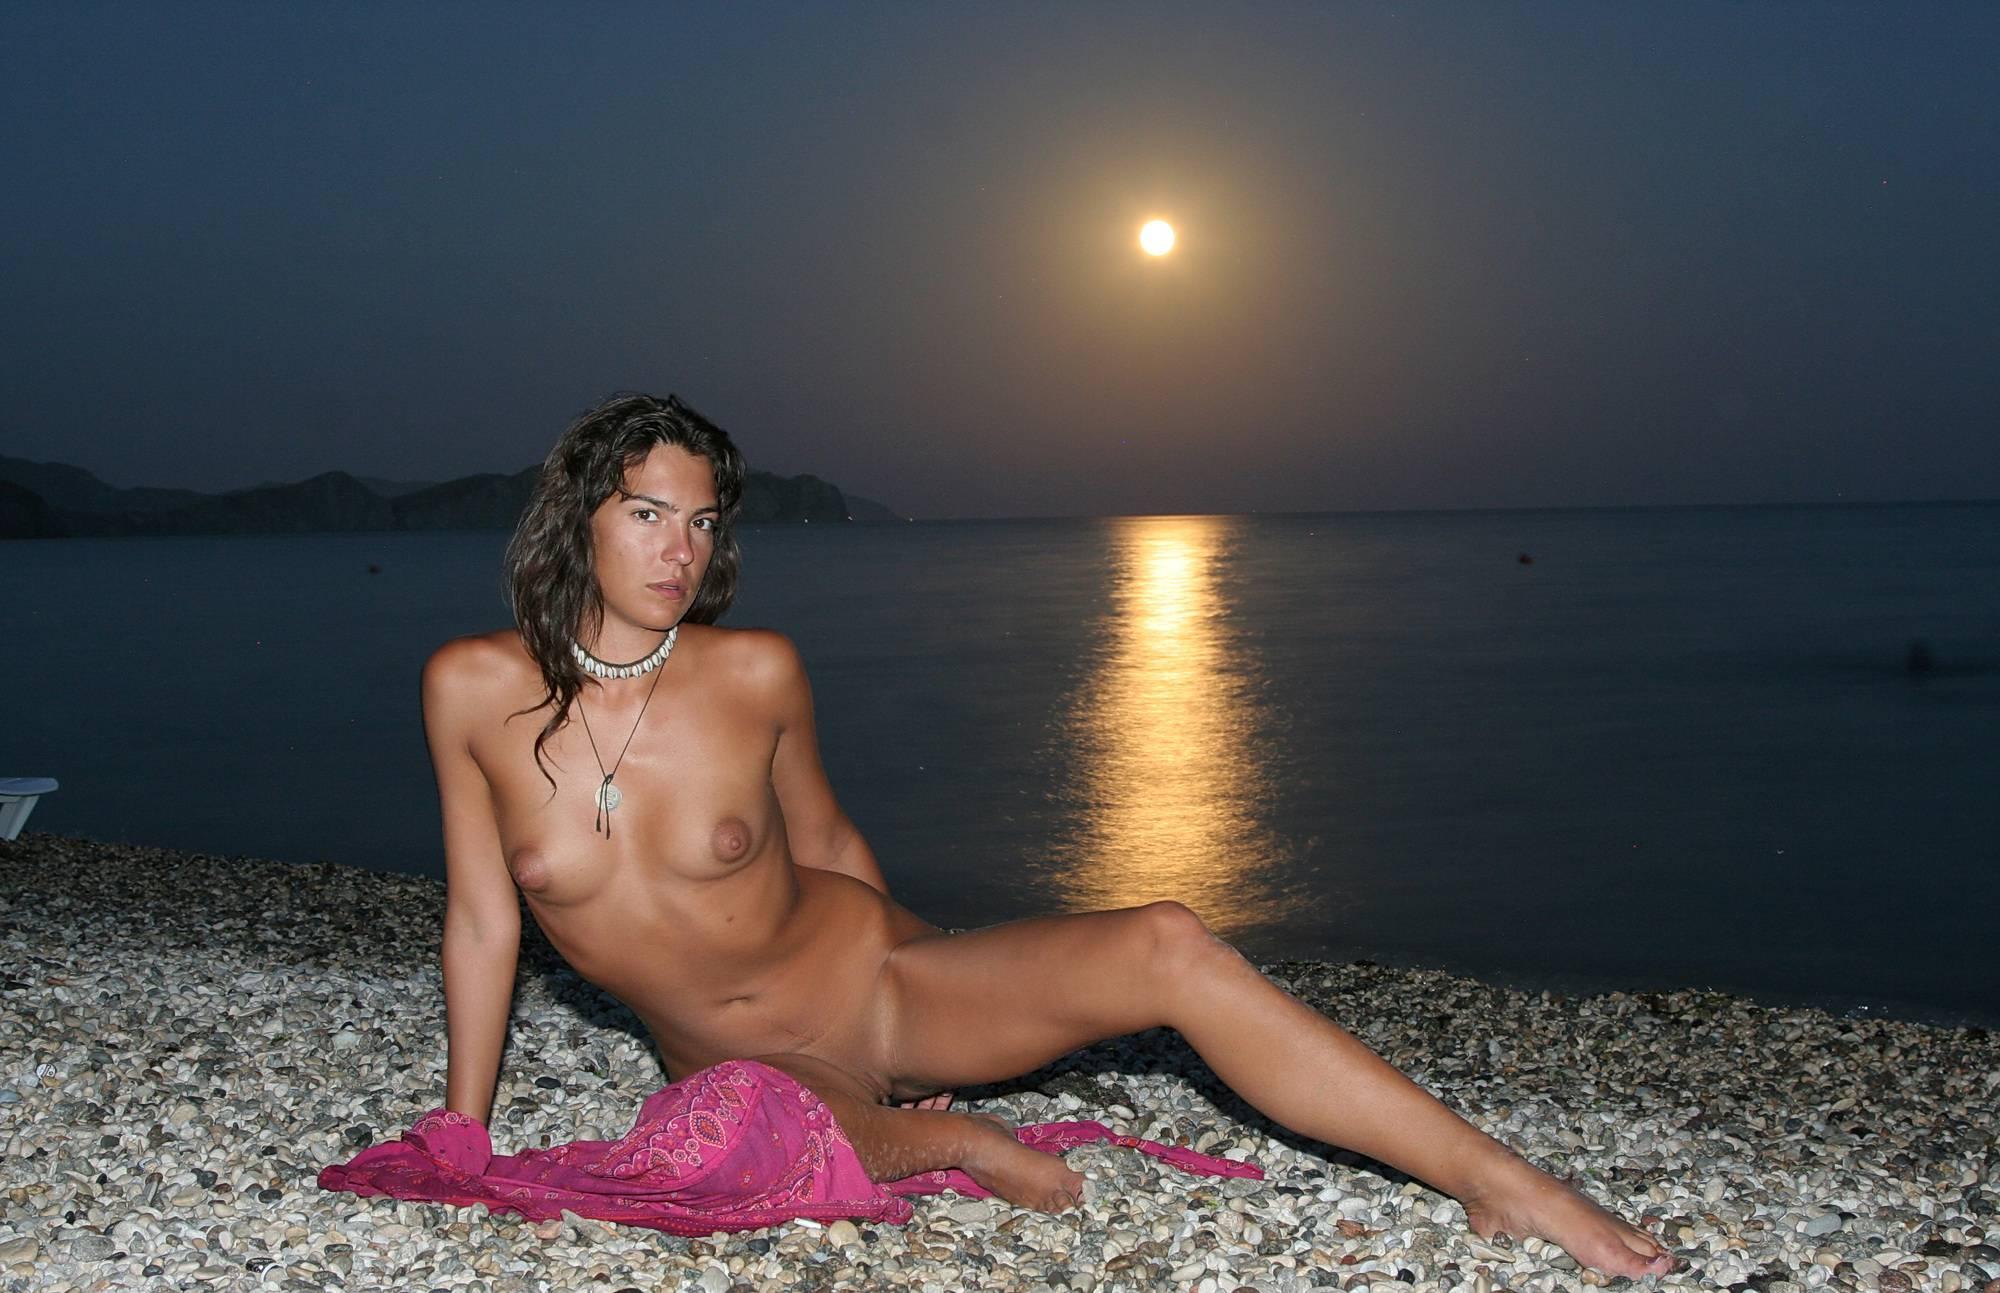 Pure Nudism Pics-Beach Side Artistic Form - 3